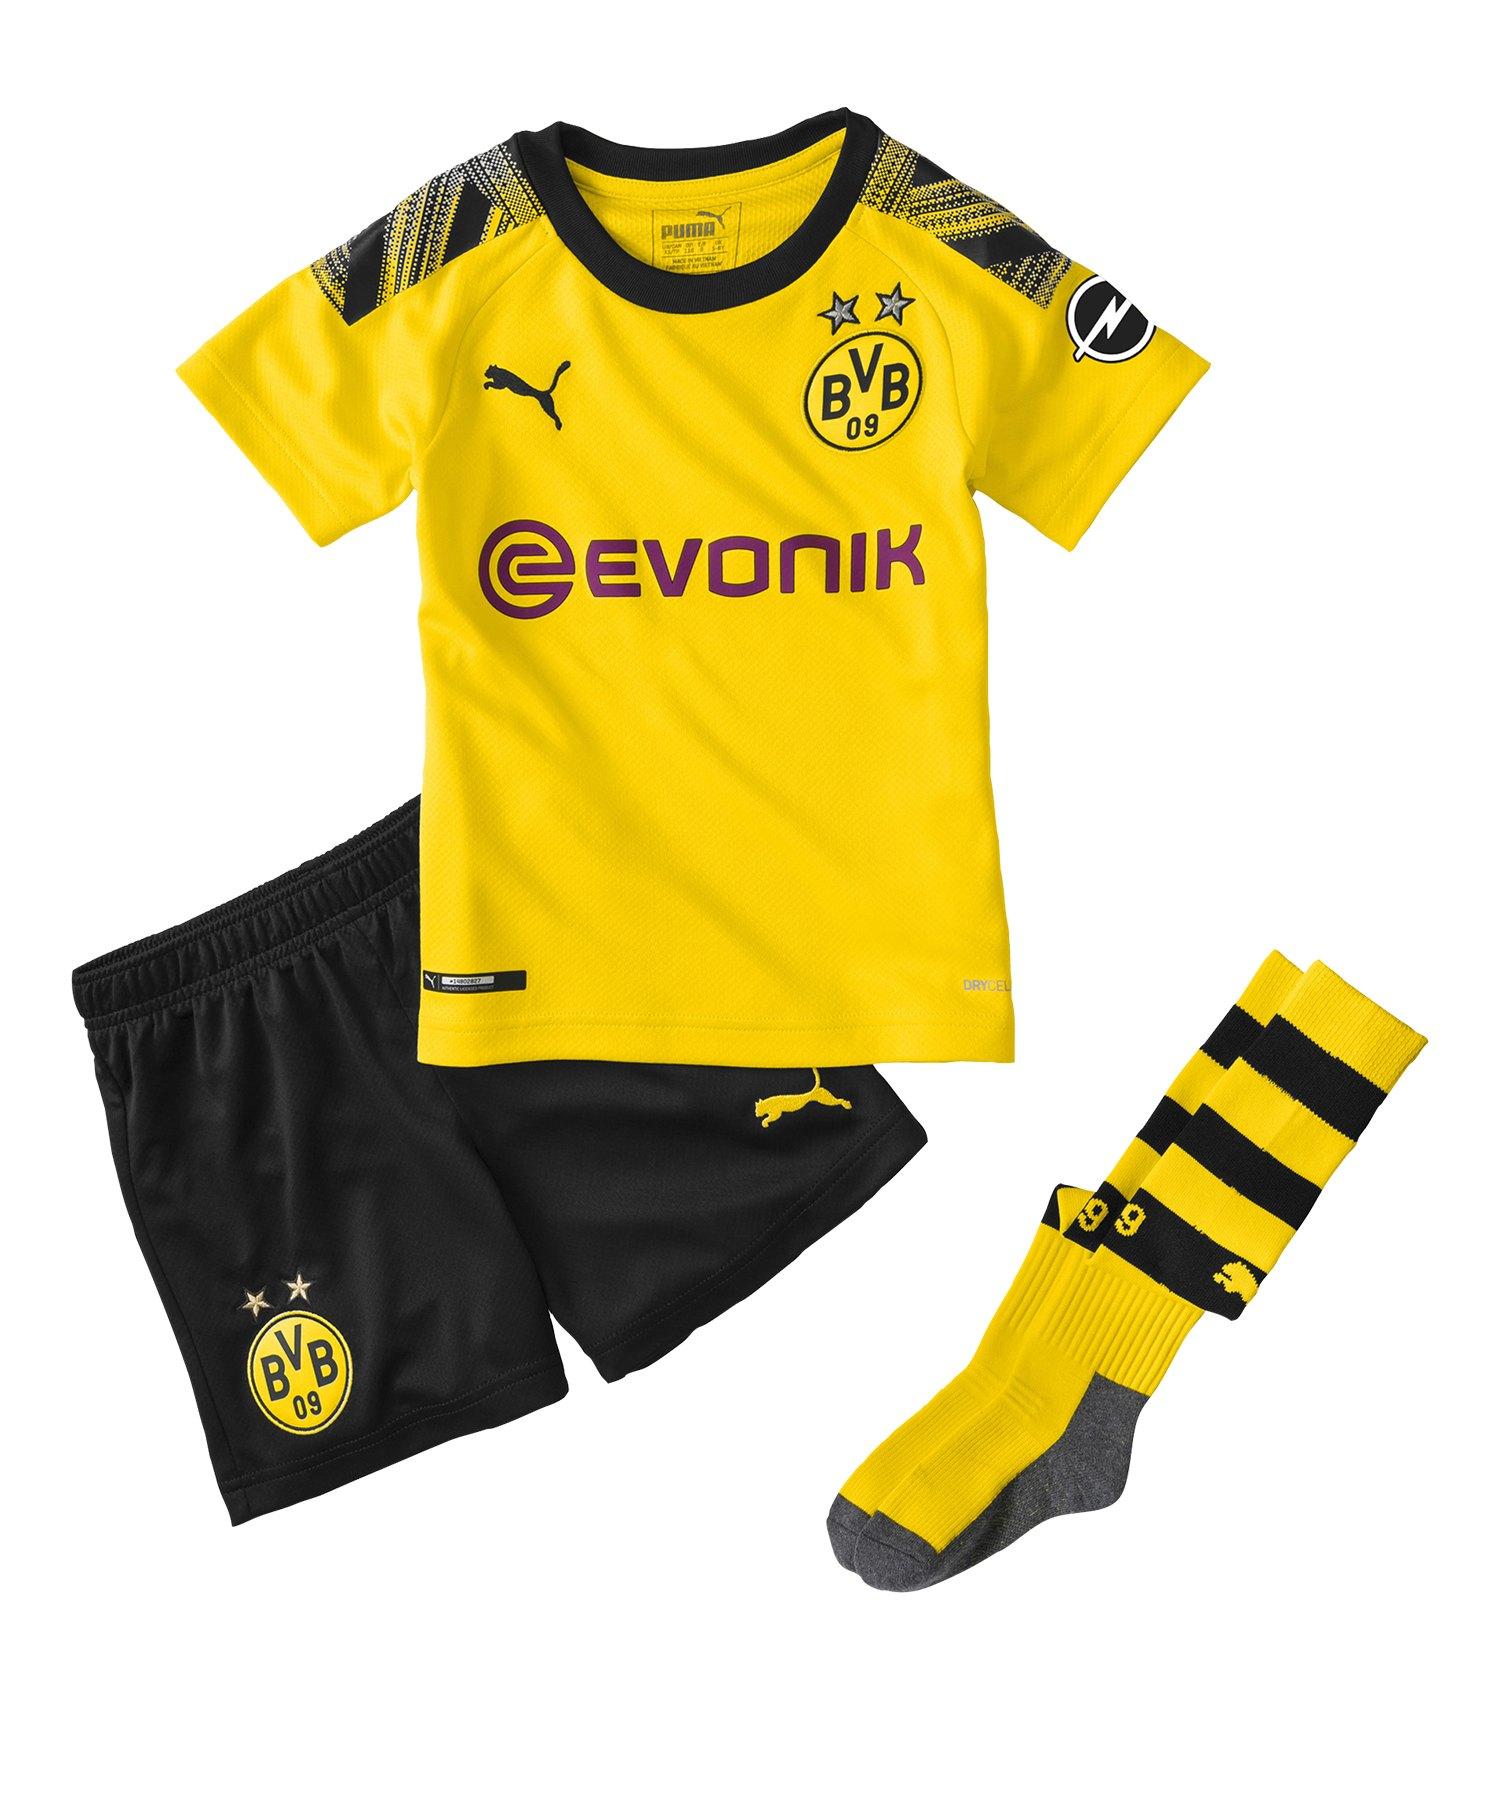 PUMA BVB Dortmund Minikit Home 2019/2020 Gelb F01 - Gelb